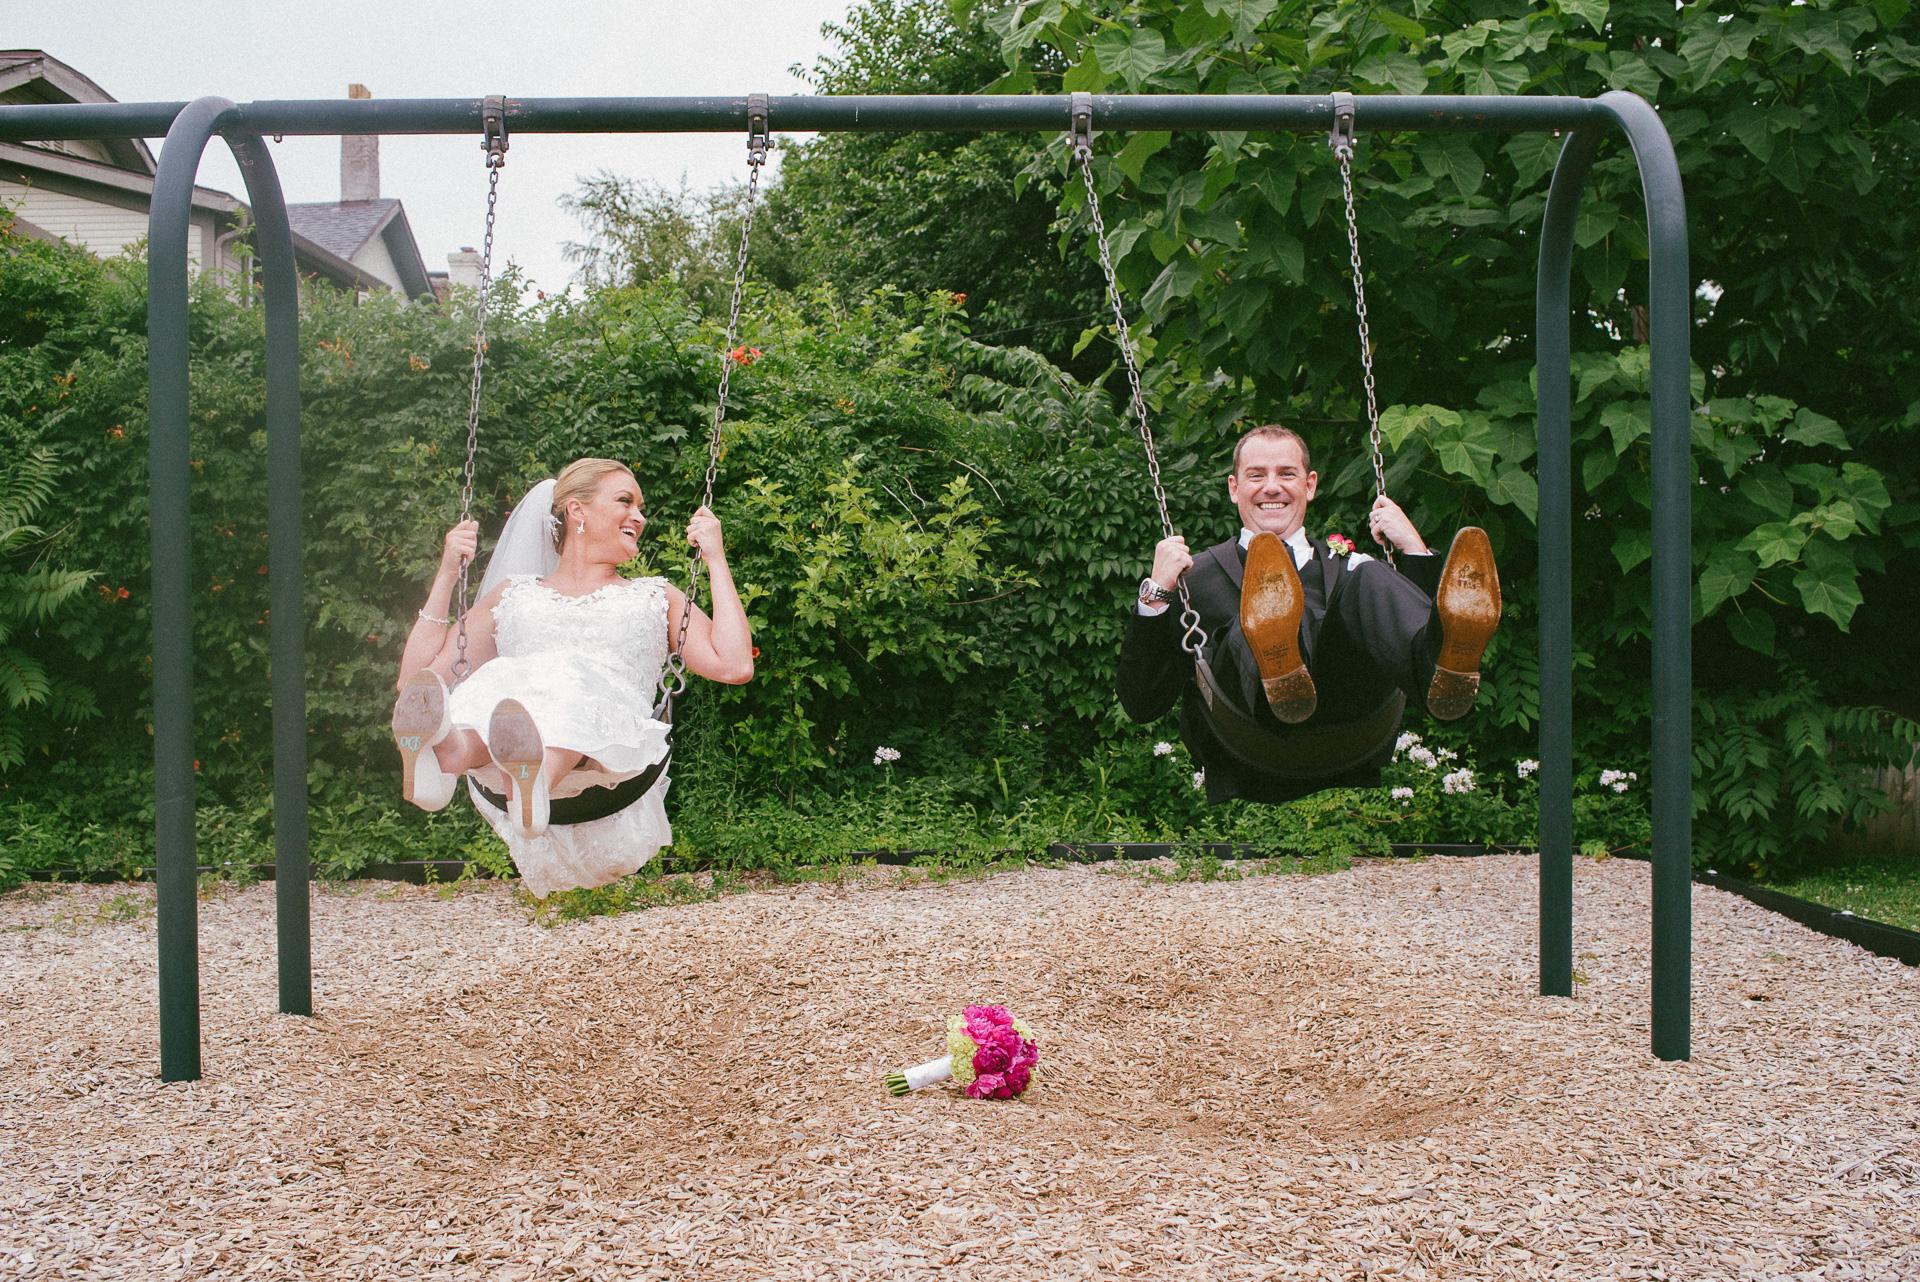 Dayton Wedding Photographer - Bride and Groom on Swing